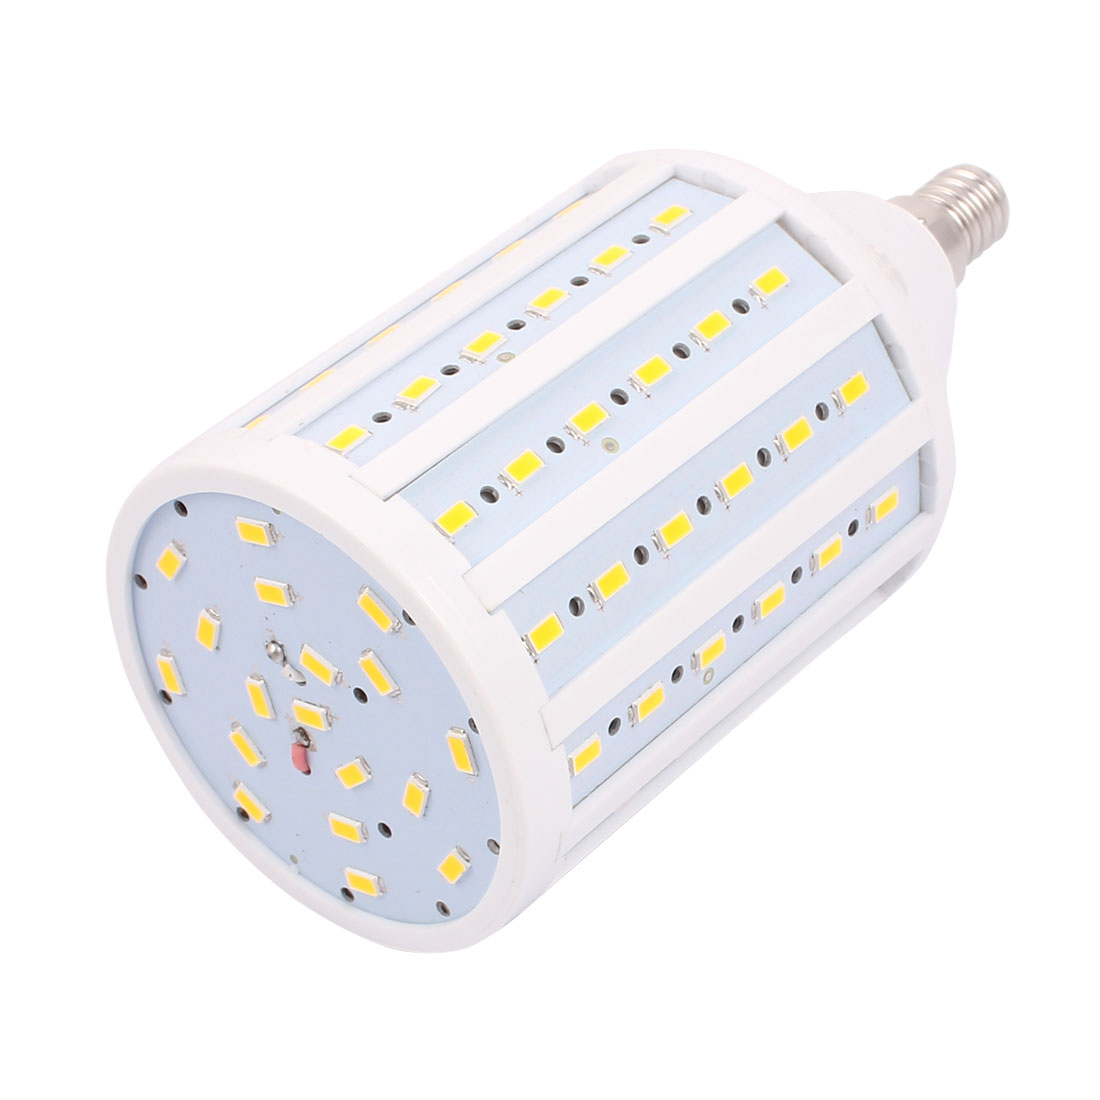 AC85-265V 25W 5730SMD LED E14 Energy Saving Corn Light Bulb Lamp Pure White